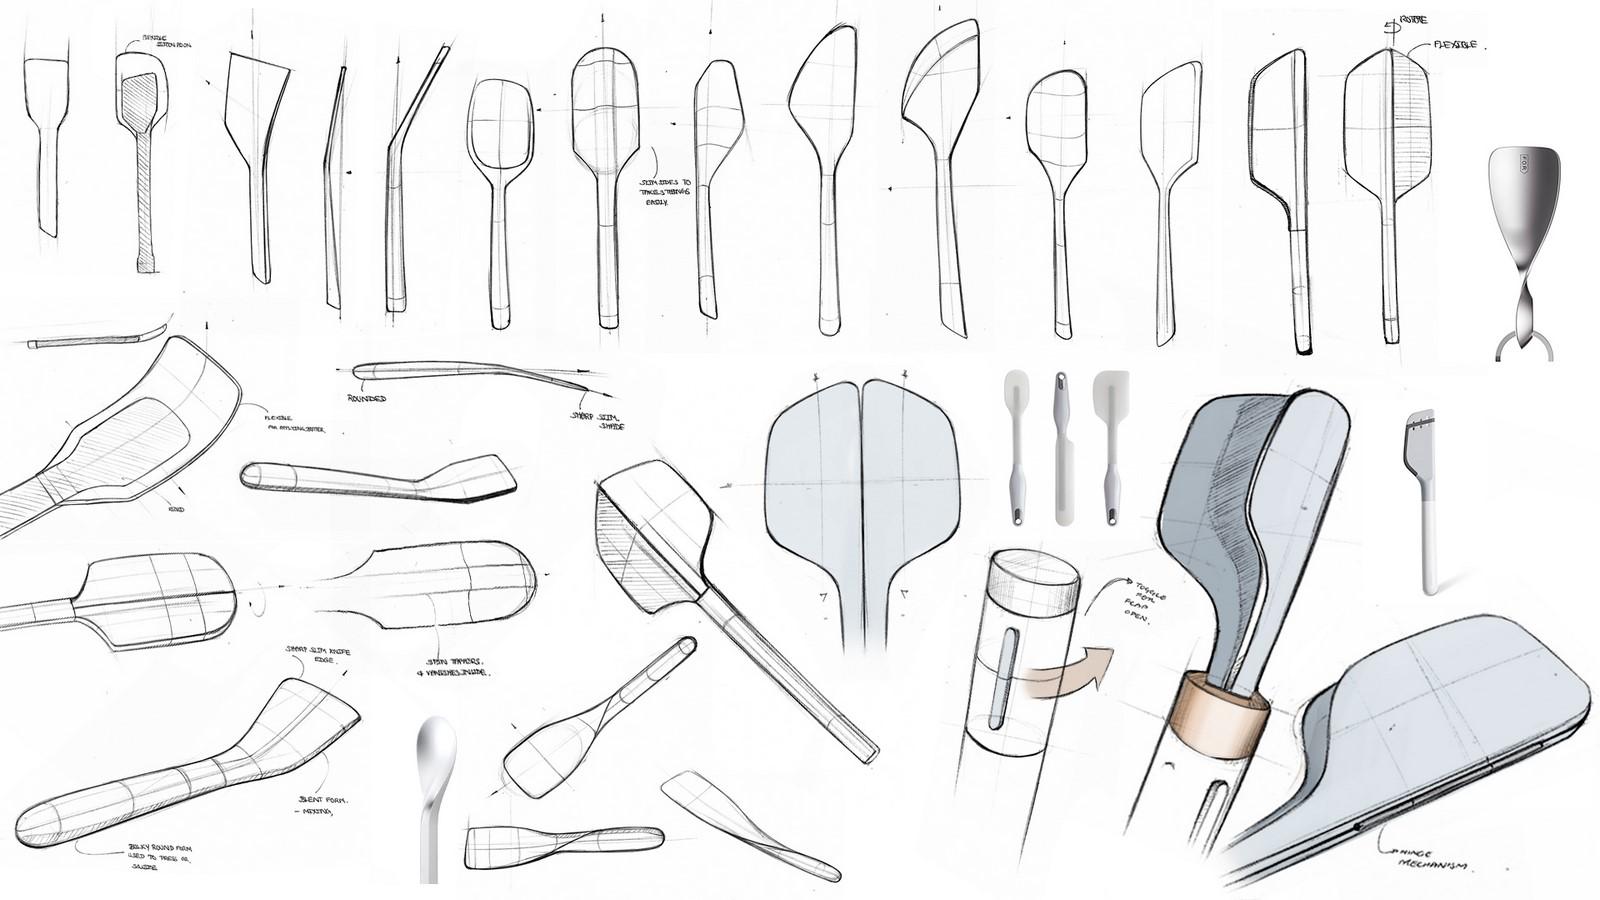 Flip | Kitchen Spatula - Sheet1